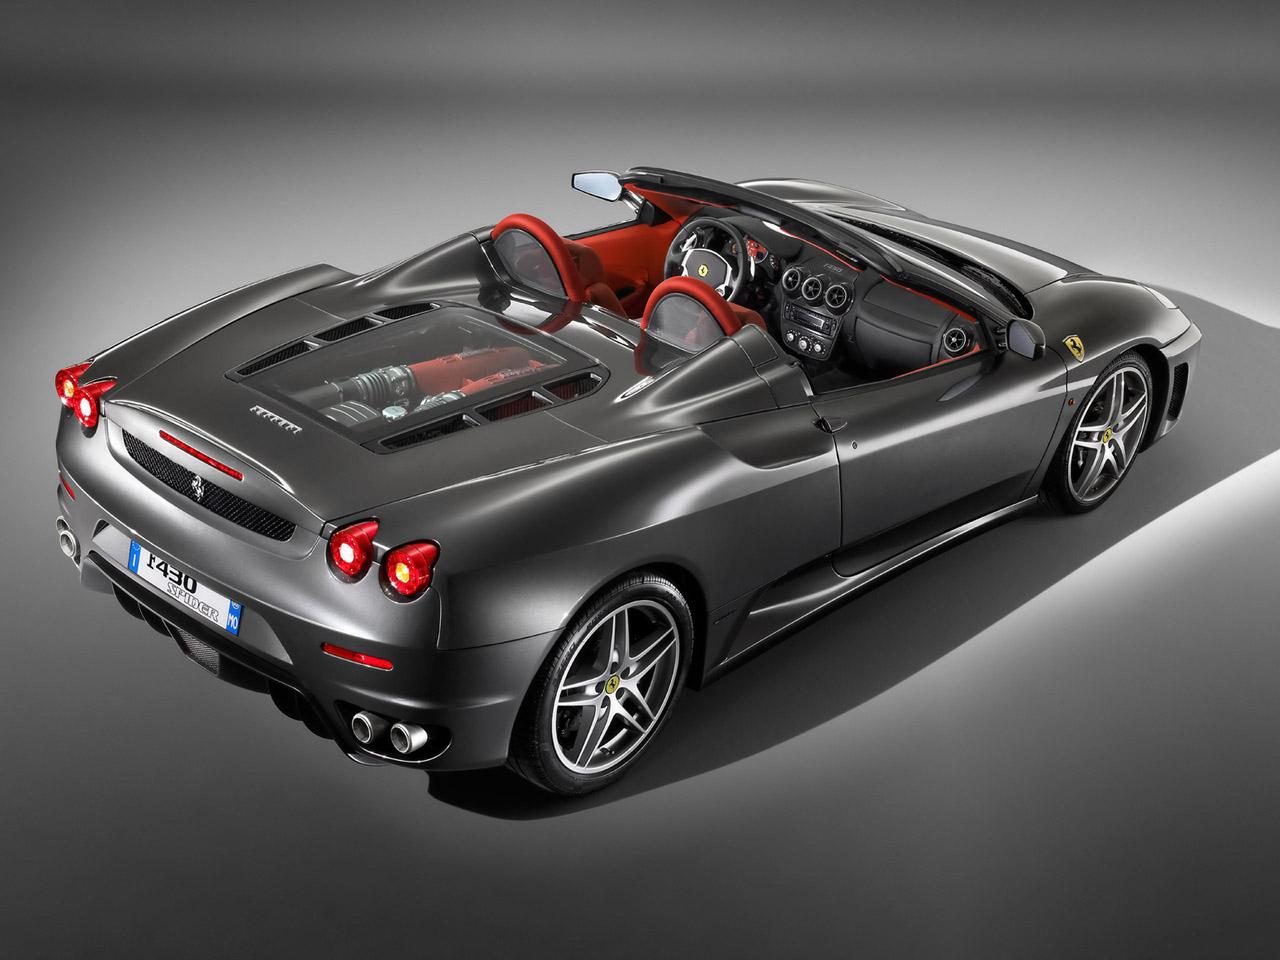 Rolls Royce Phantom Hd Wallpapers >> World Of Cars: Ferrari f430 spider wallpaper